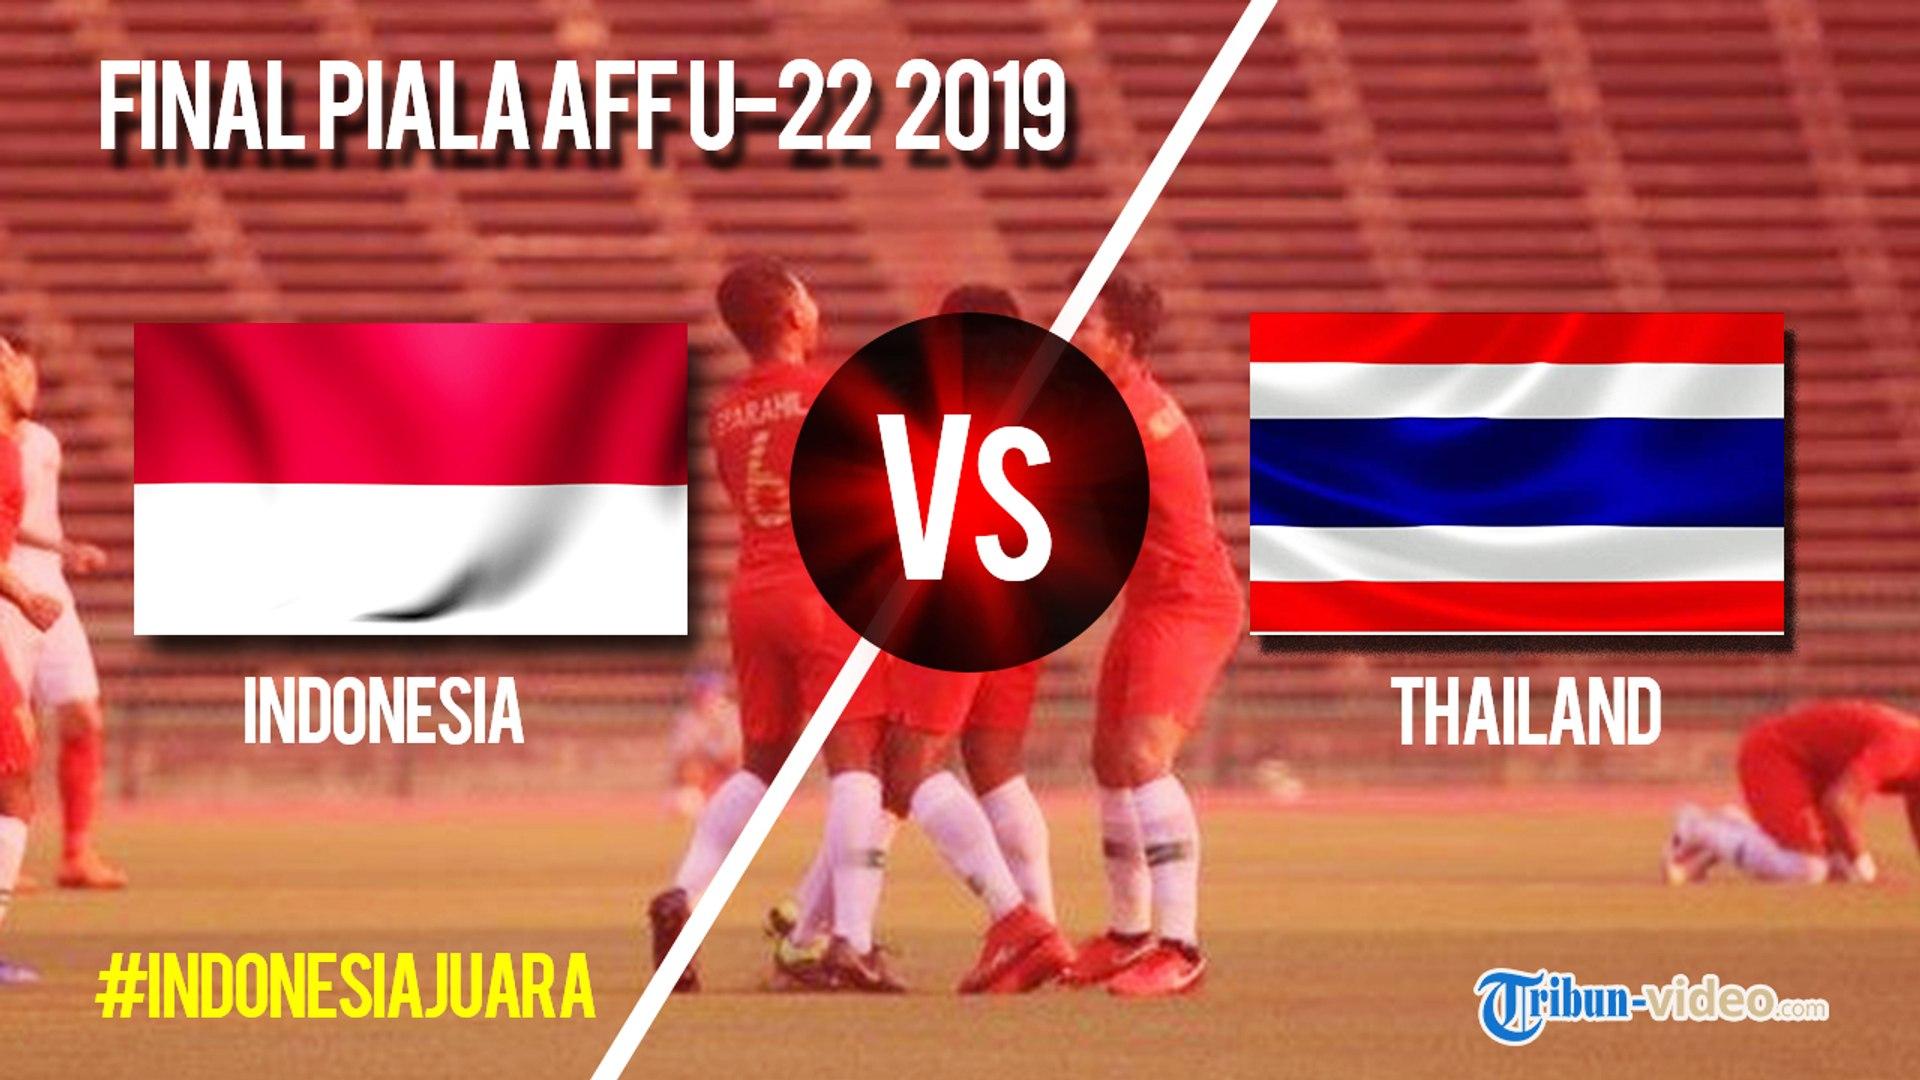 Jadwal Laga Final Piala AFF U-22 Indonesia Vs Thailand, Selasa Pukul 18.30 WIB